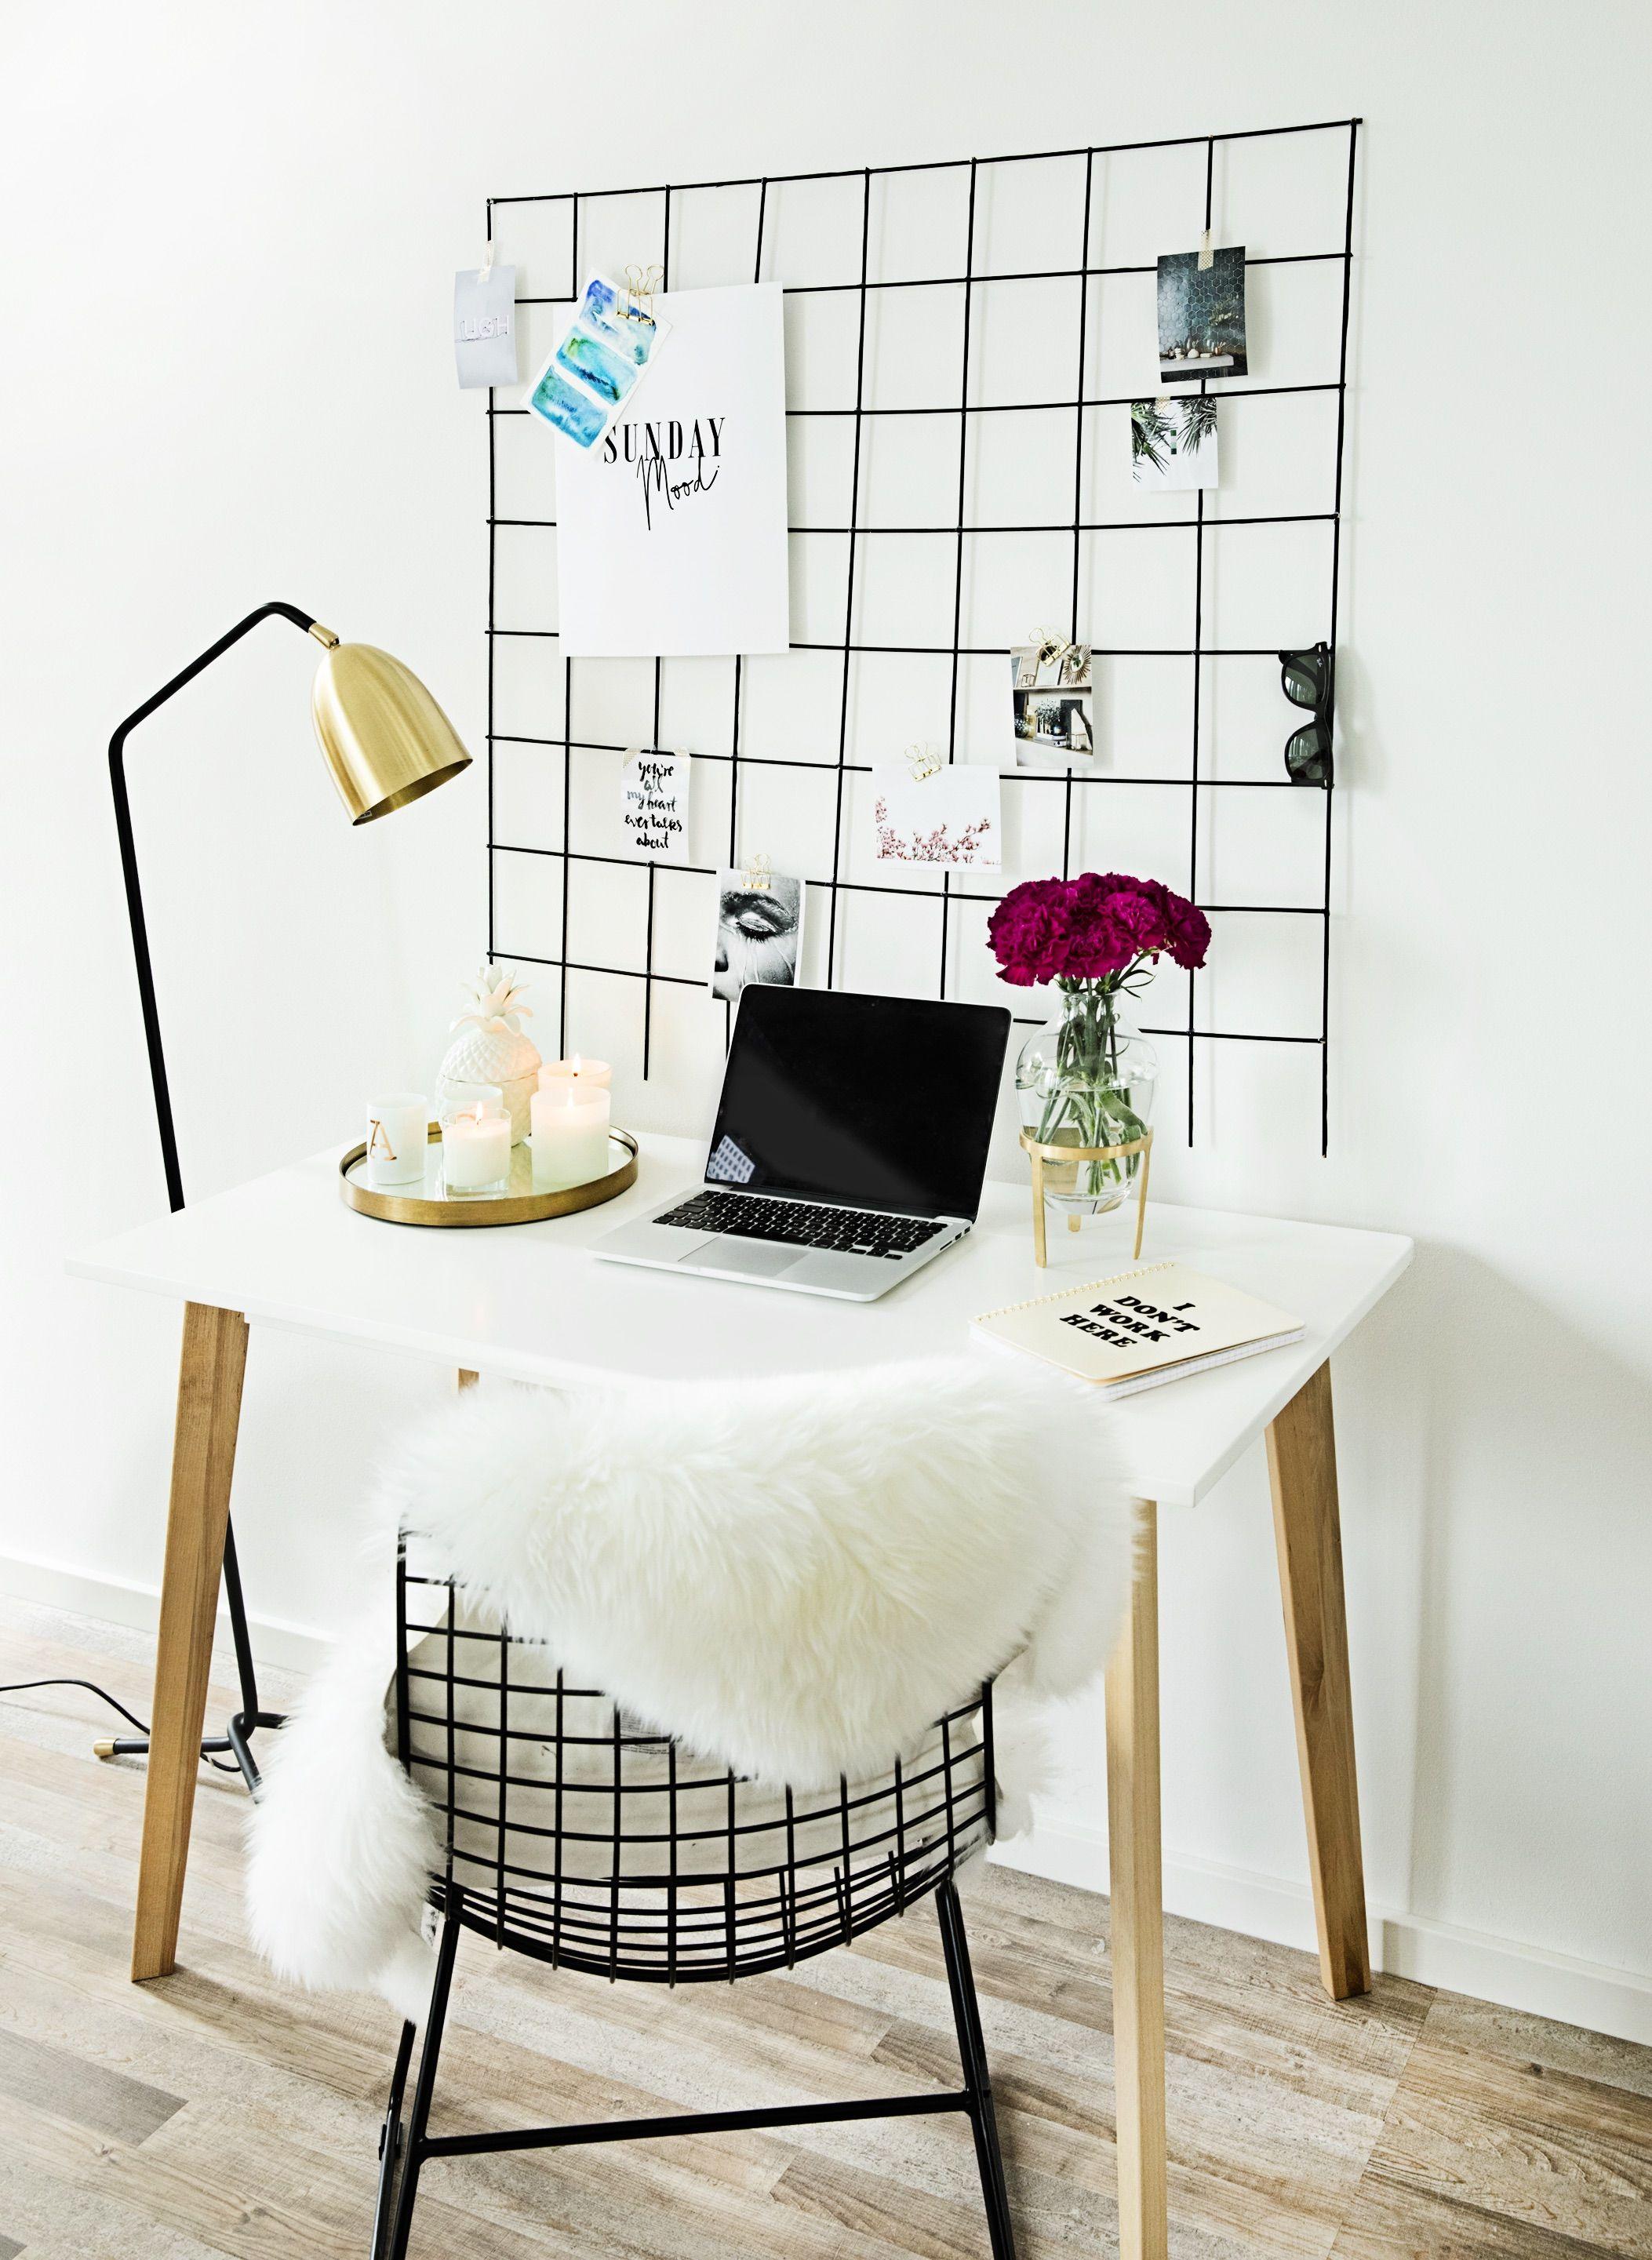 diy gitter pinnwand pinterest gitter pinnw nde und arbeitszimmer. Black Bedroom Furniture Sets. Home Design Ideas